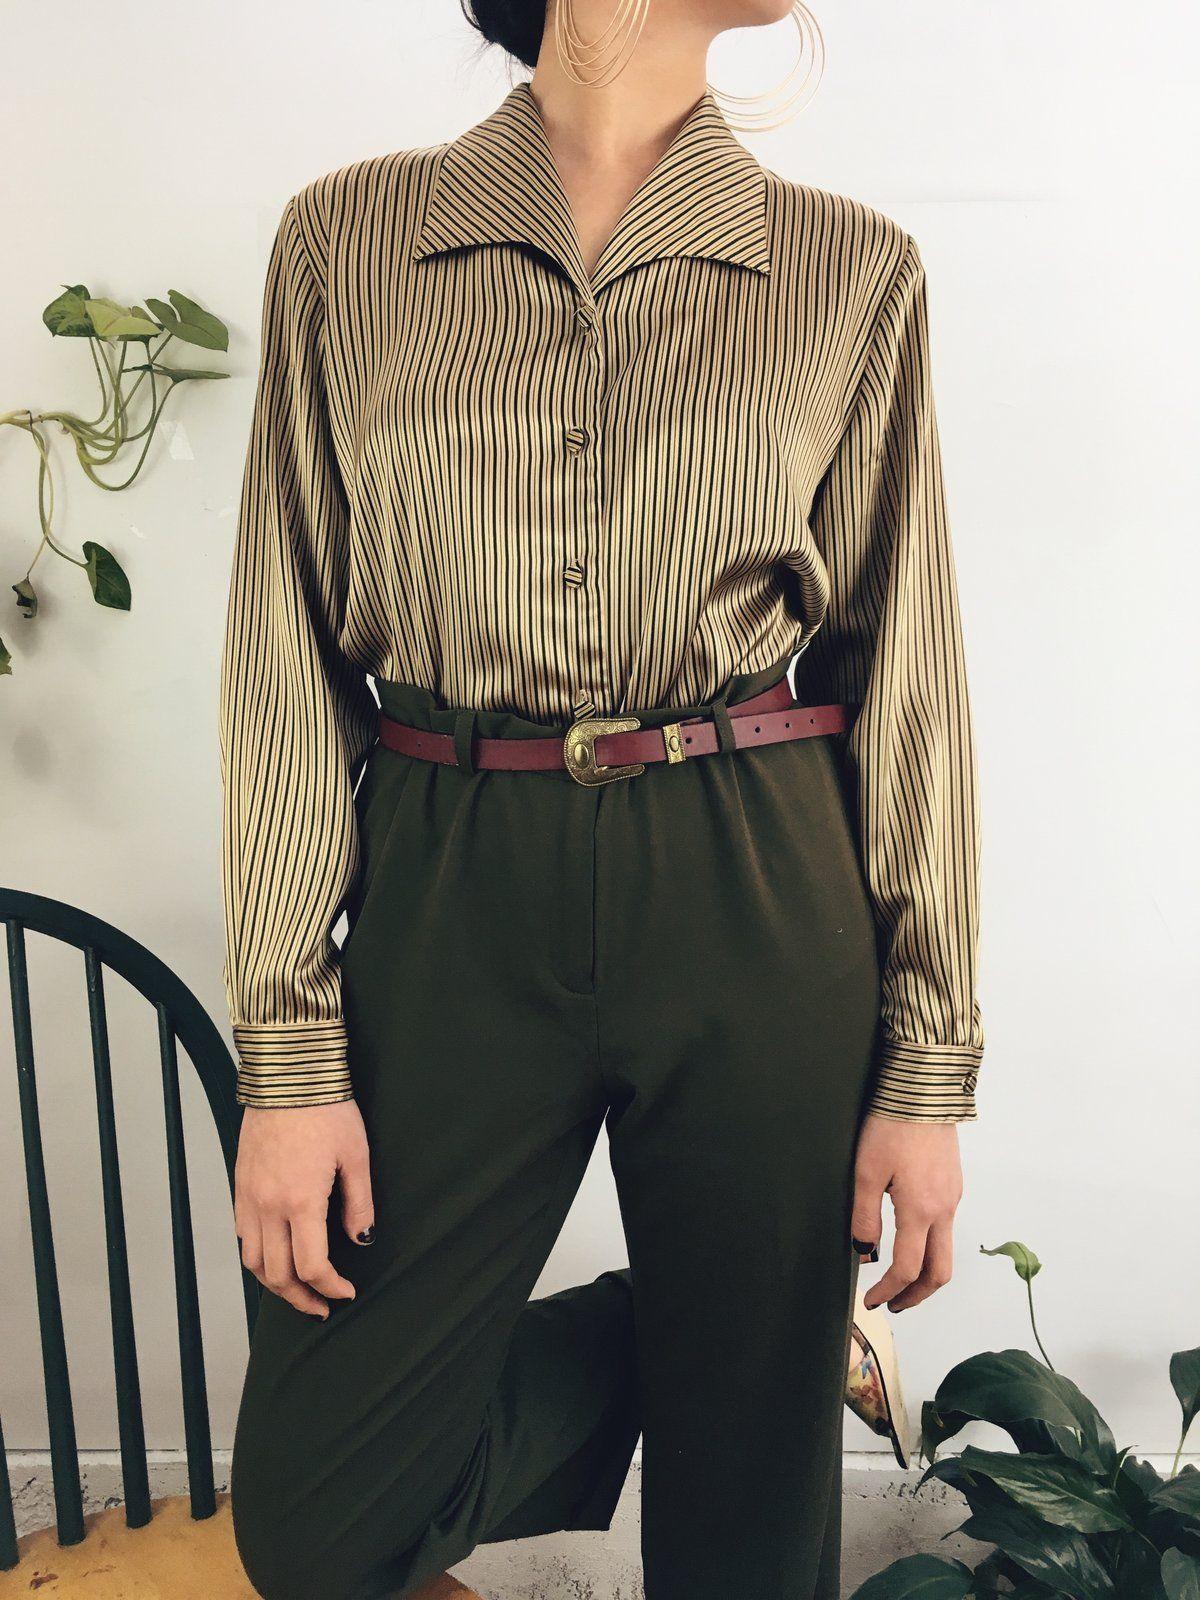 The Striped Golden Blouse Vintage Fashion 90s Vintage Fashion 1950s Vintage Clothes Women Retro F Vintage Fashion 90s Blouse Vintage Vintage Clothes Women